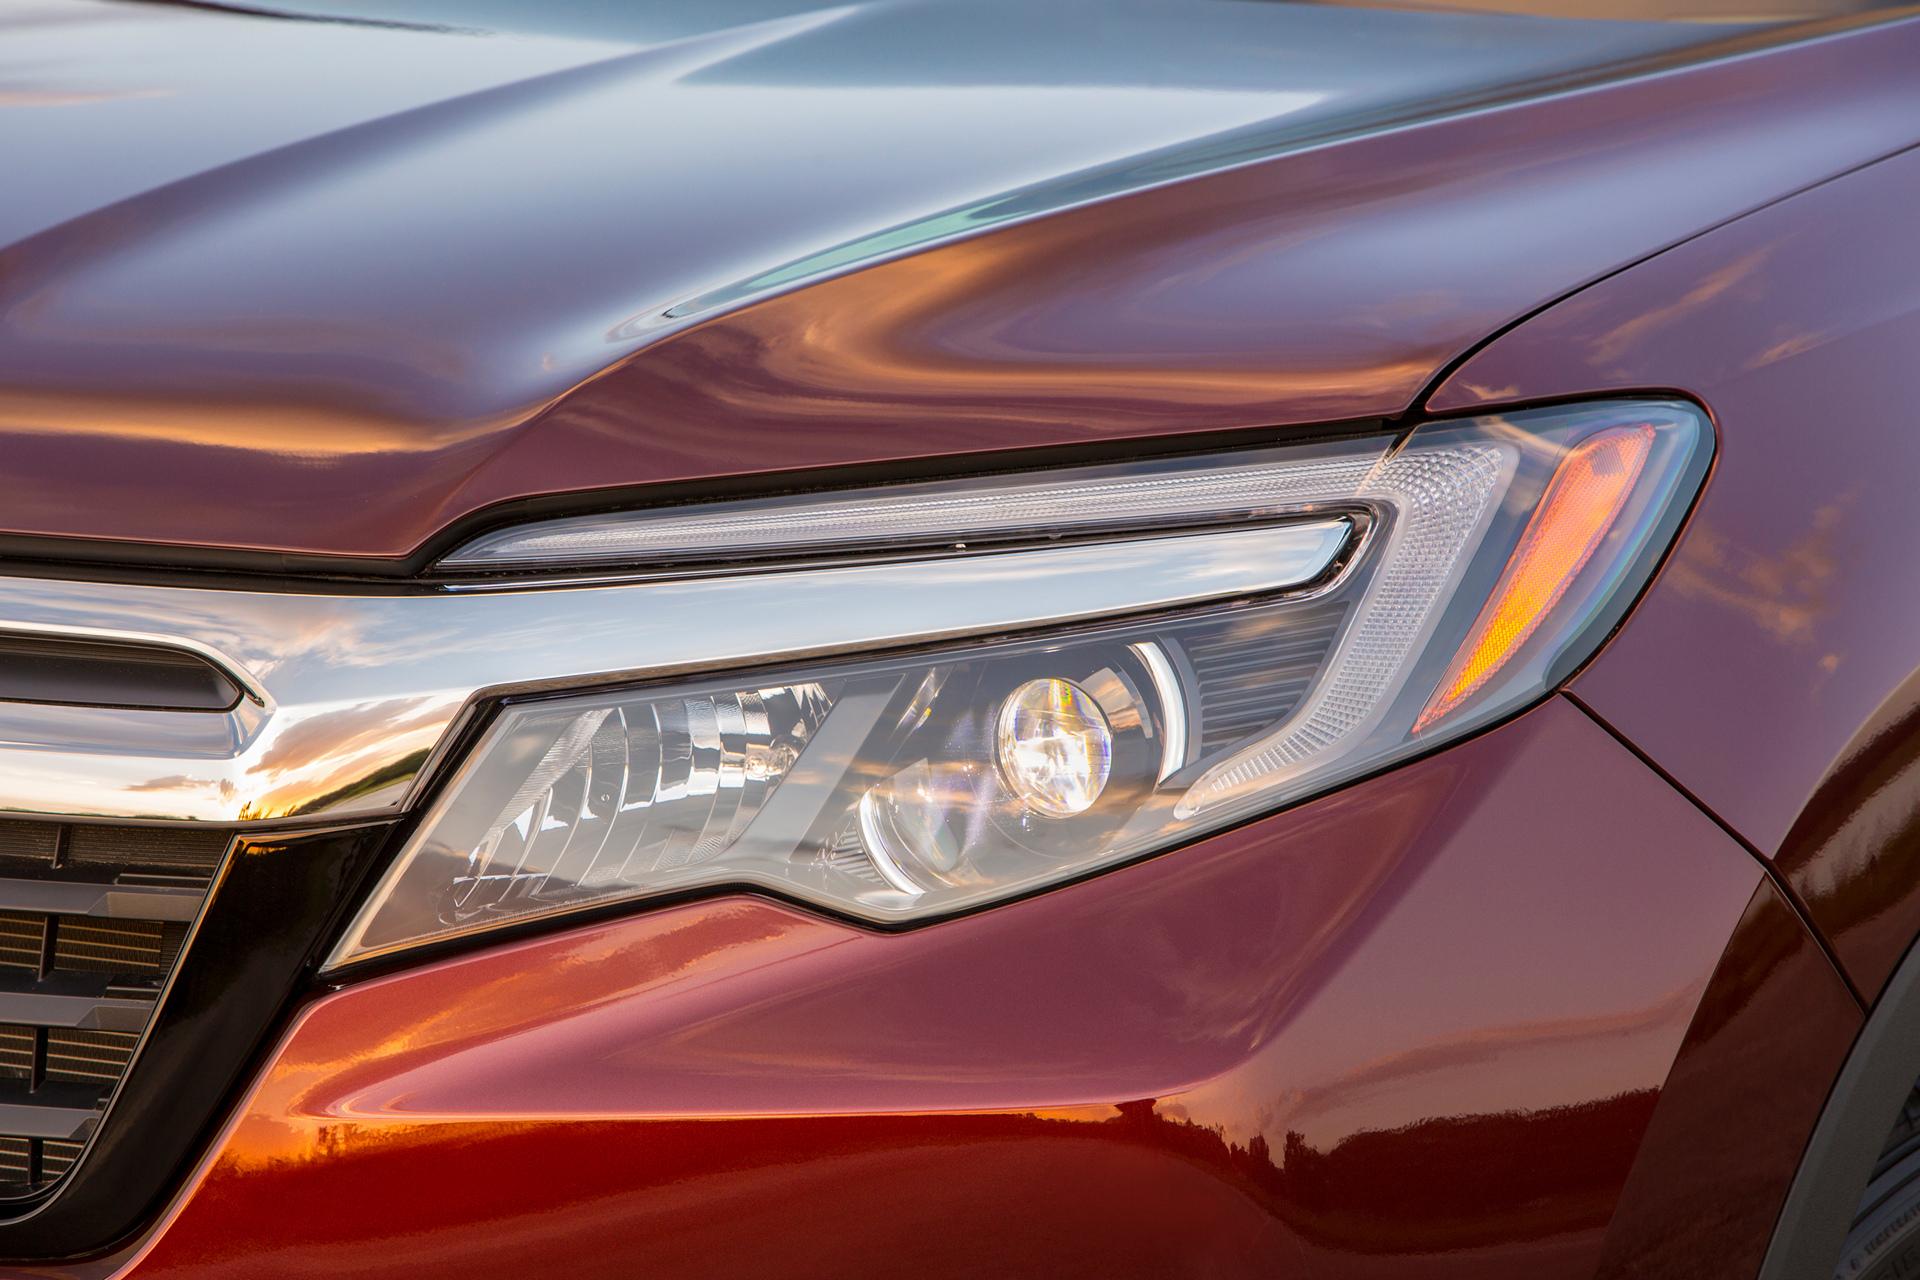 2017 Honda Ridgeline © Honda Motor Co., Ltd.